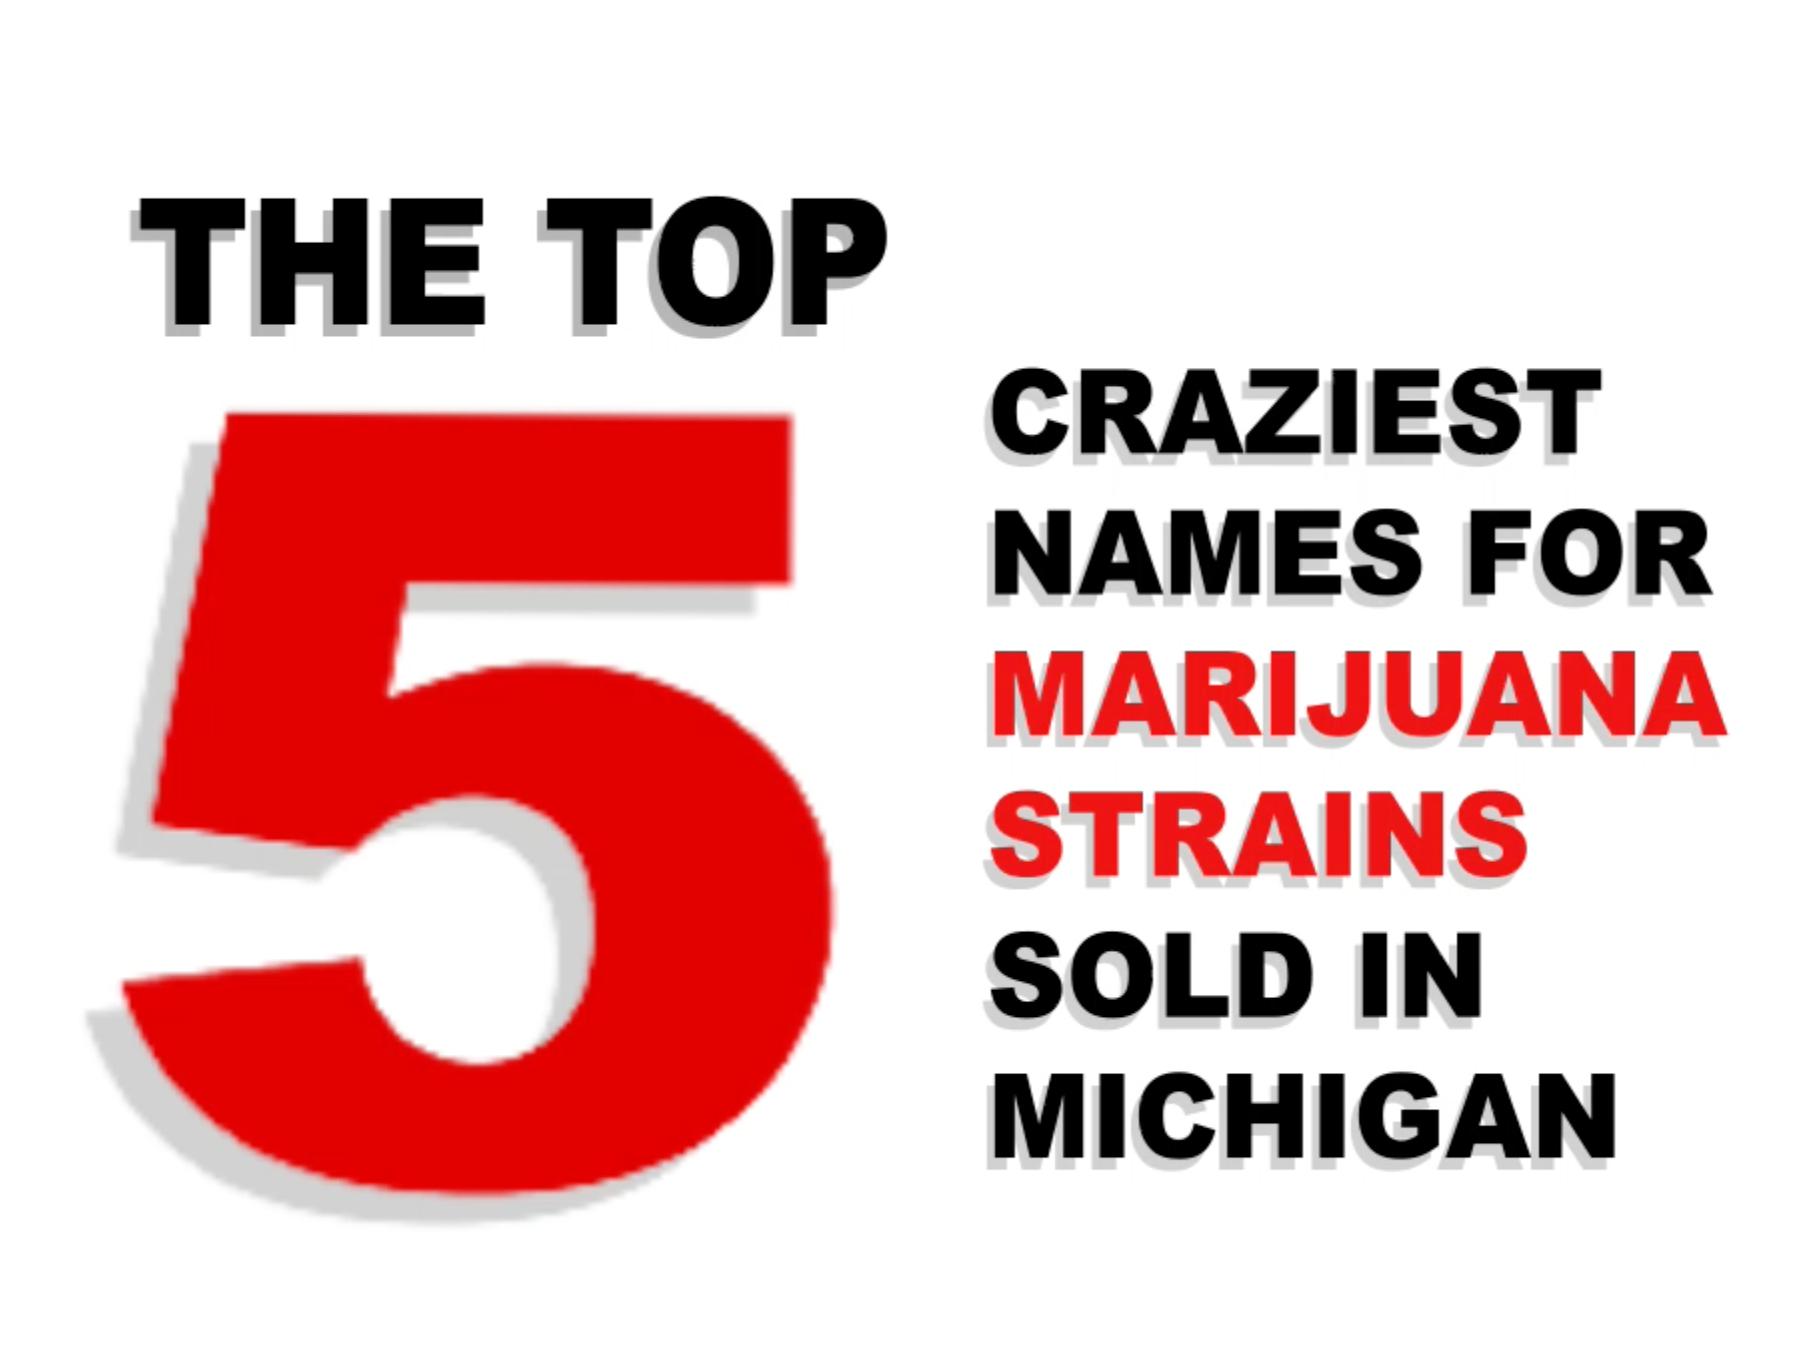 Marijuana strains in Michigan have bizarre names | Thompson